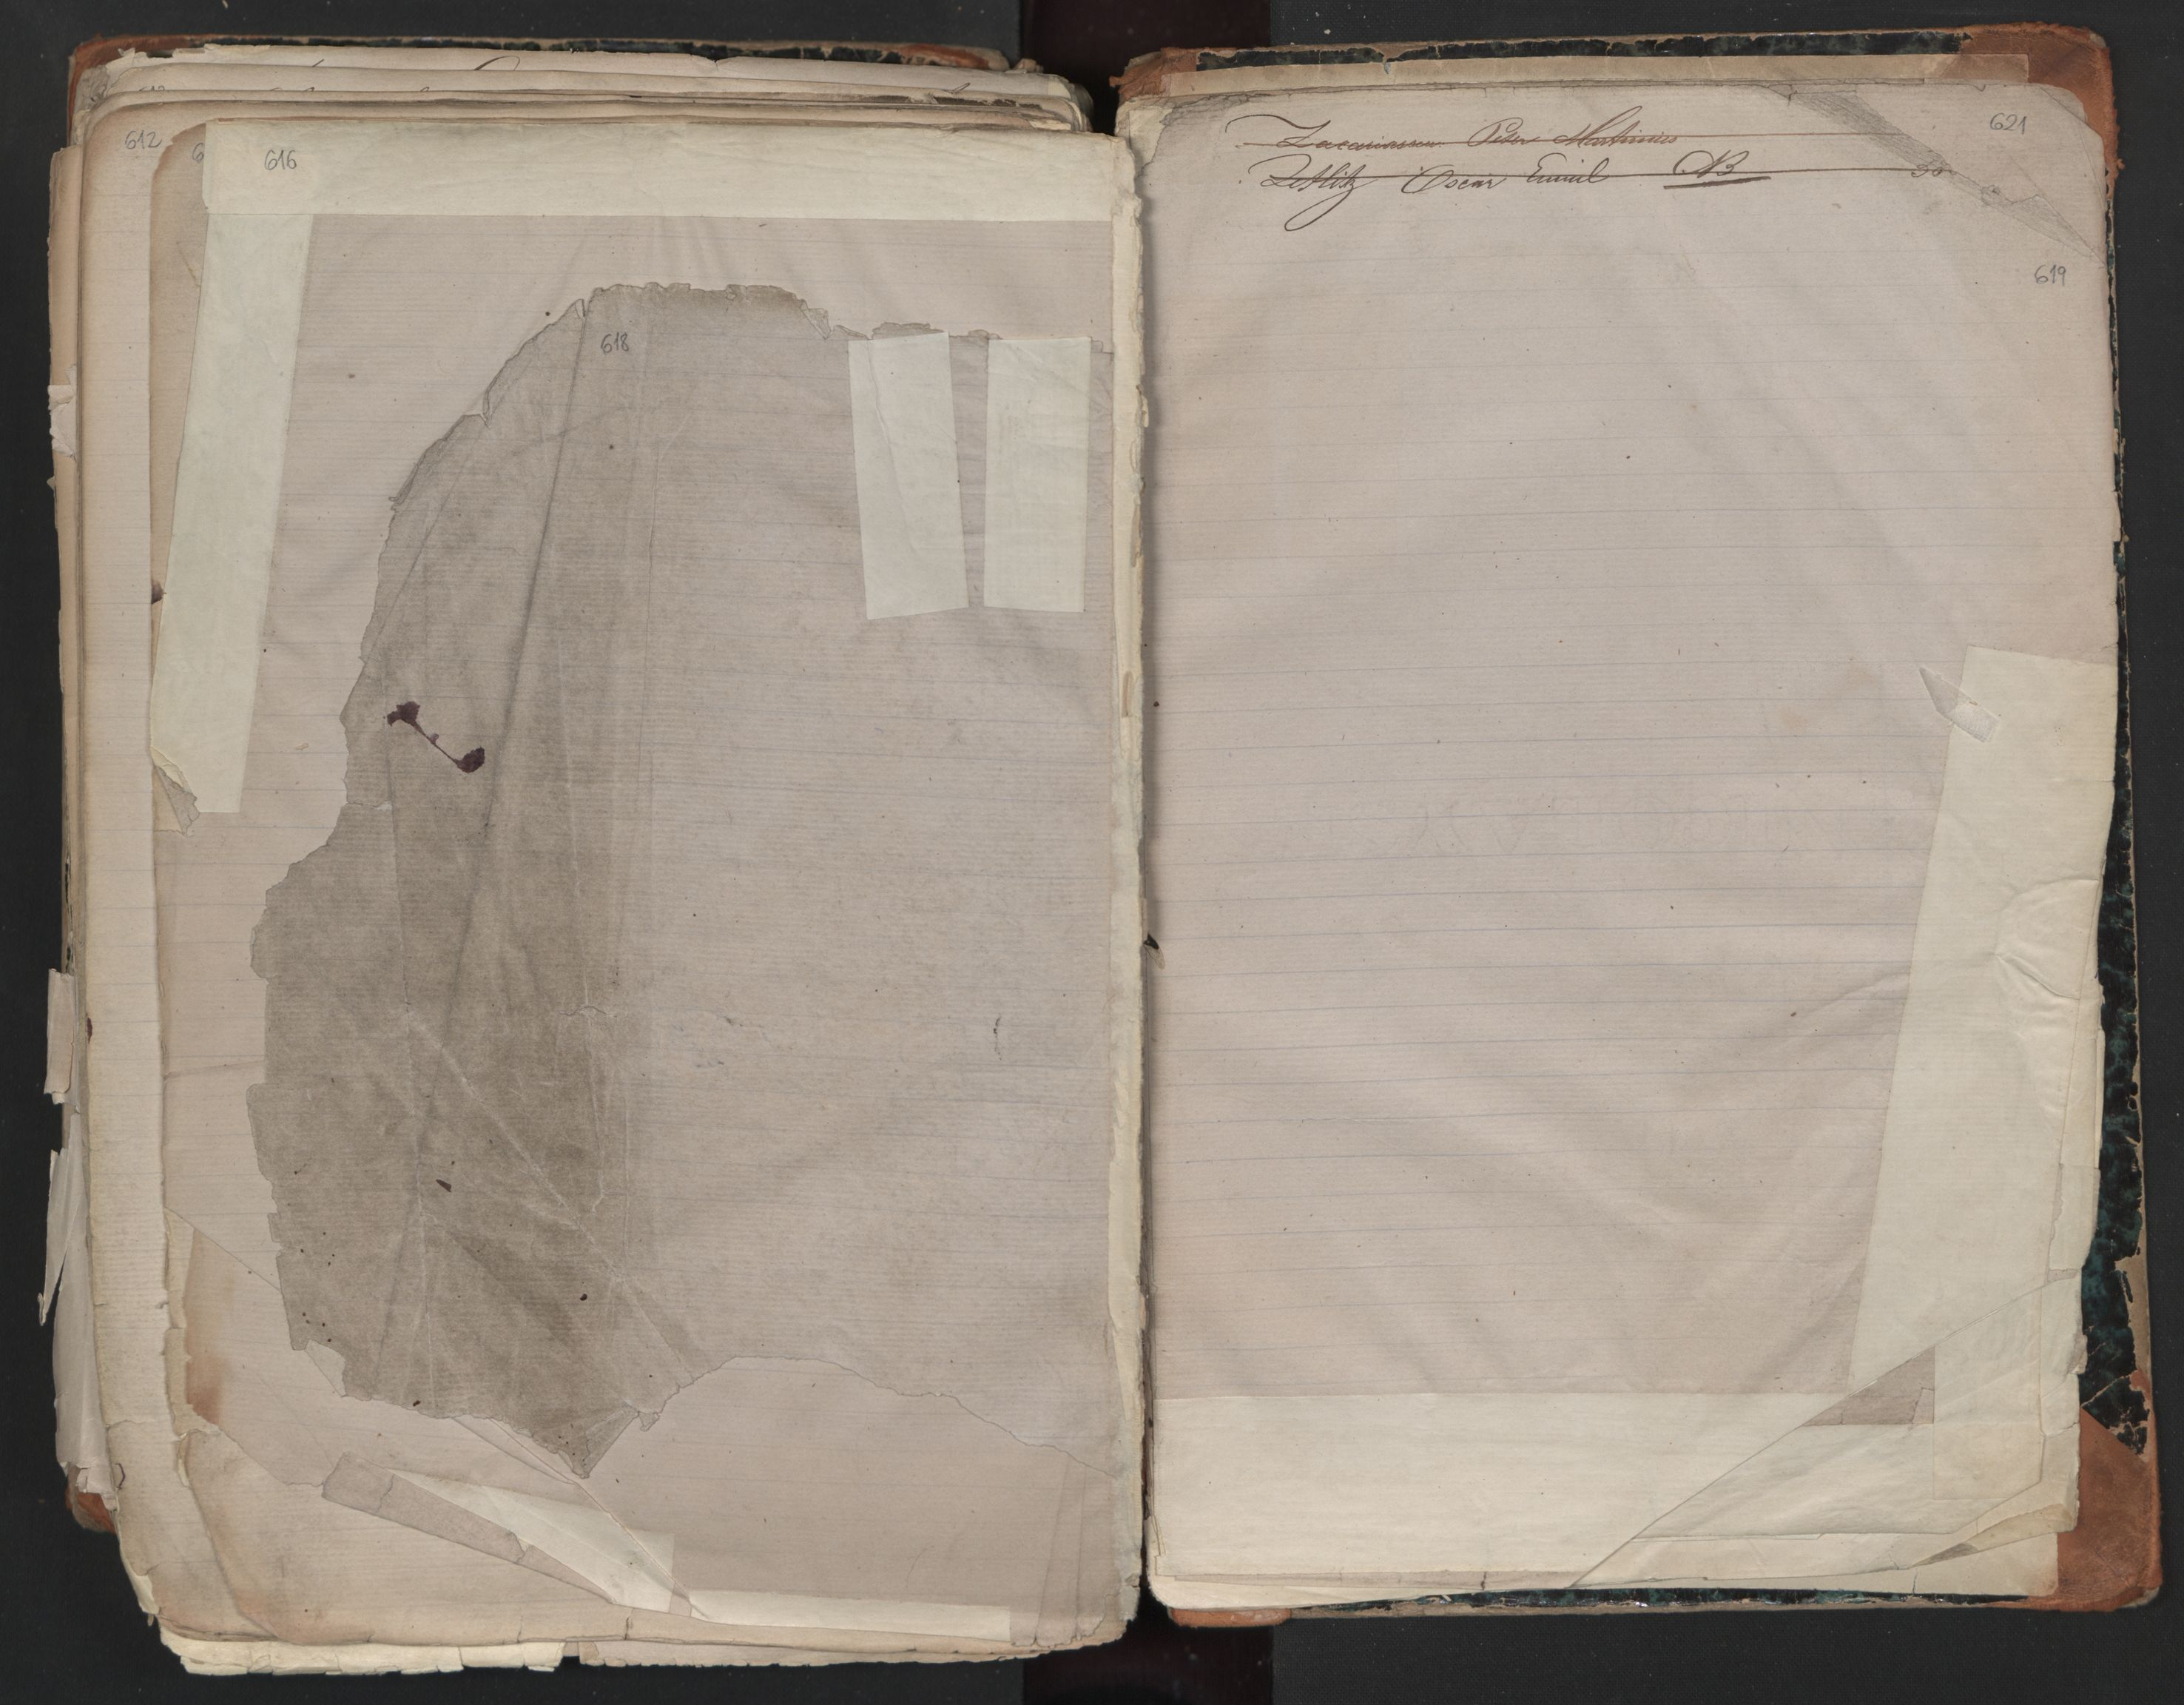 SAO, Oslo sjømannskontor, F/Fa/L0001: Register for Kristiania krets, 1866-1891, s. 618-619